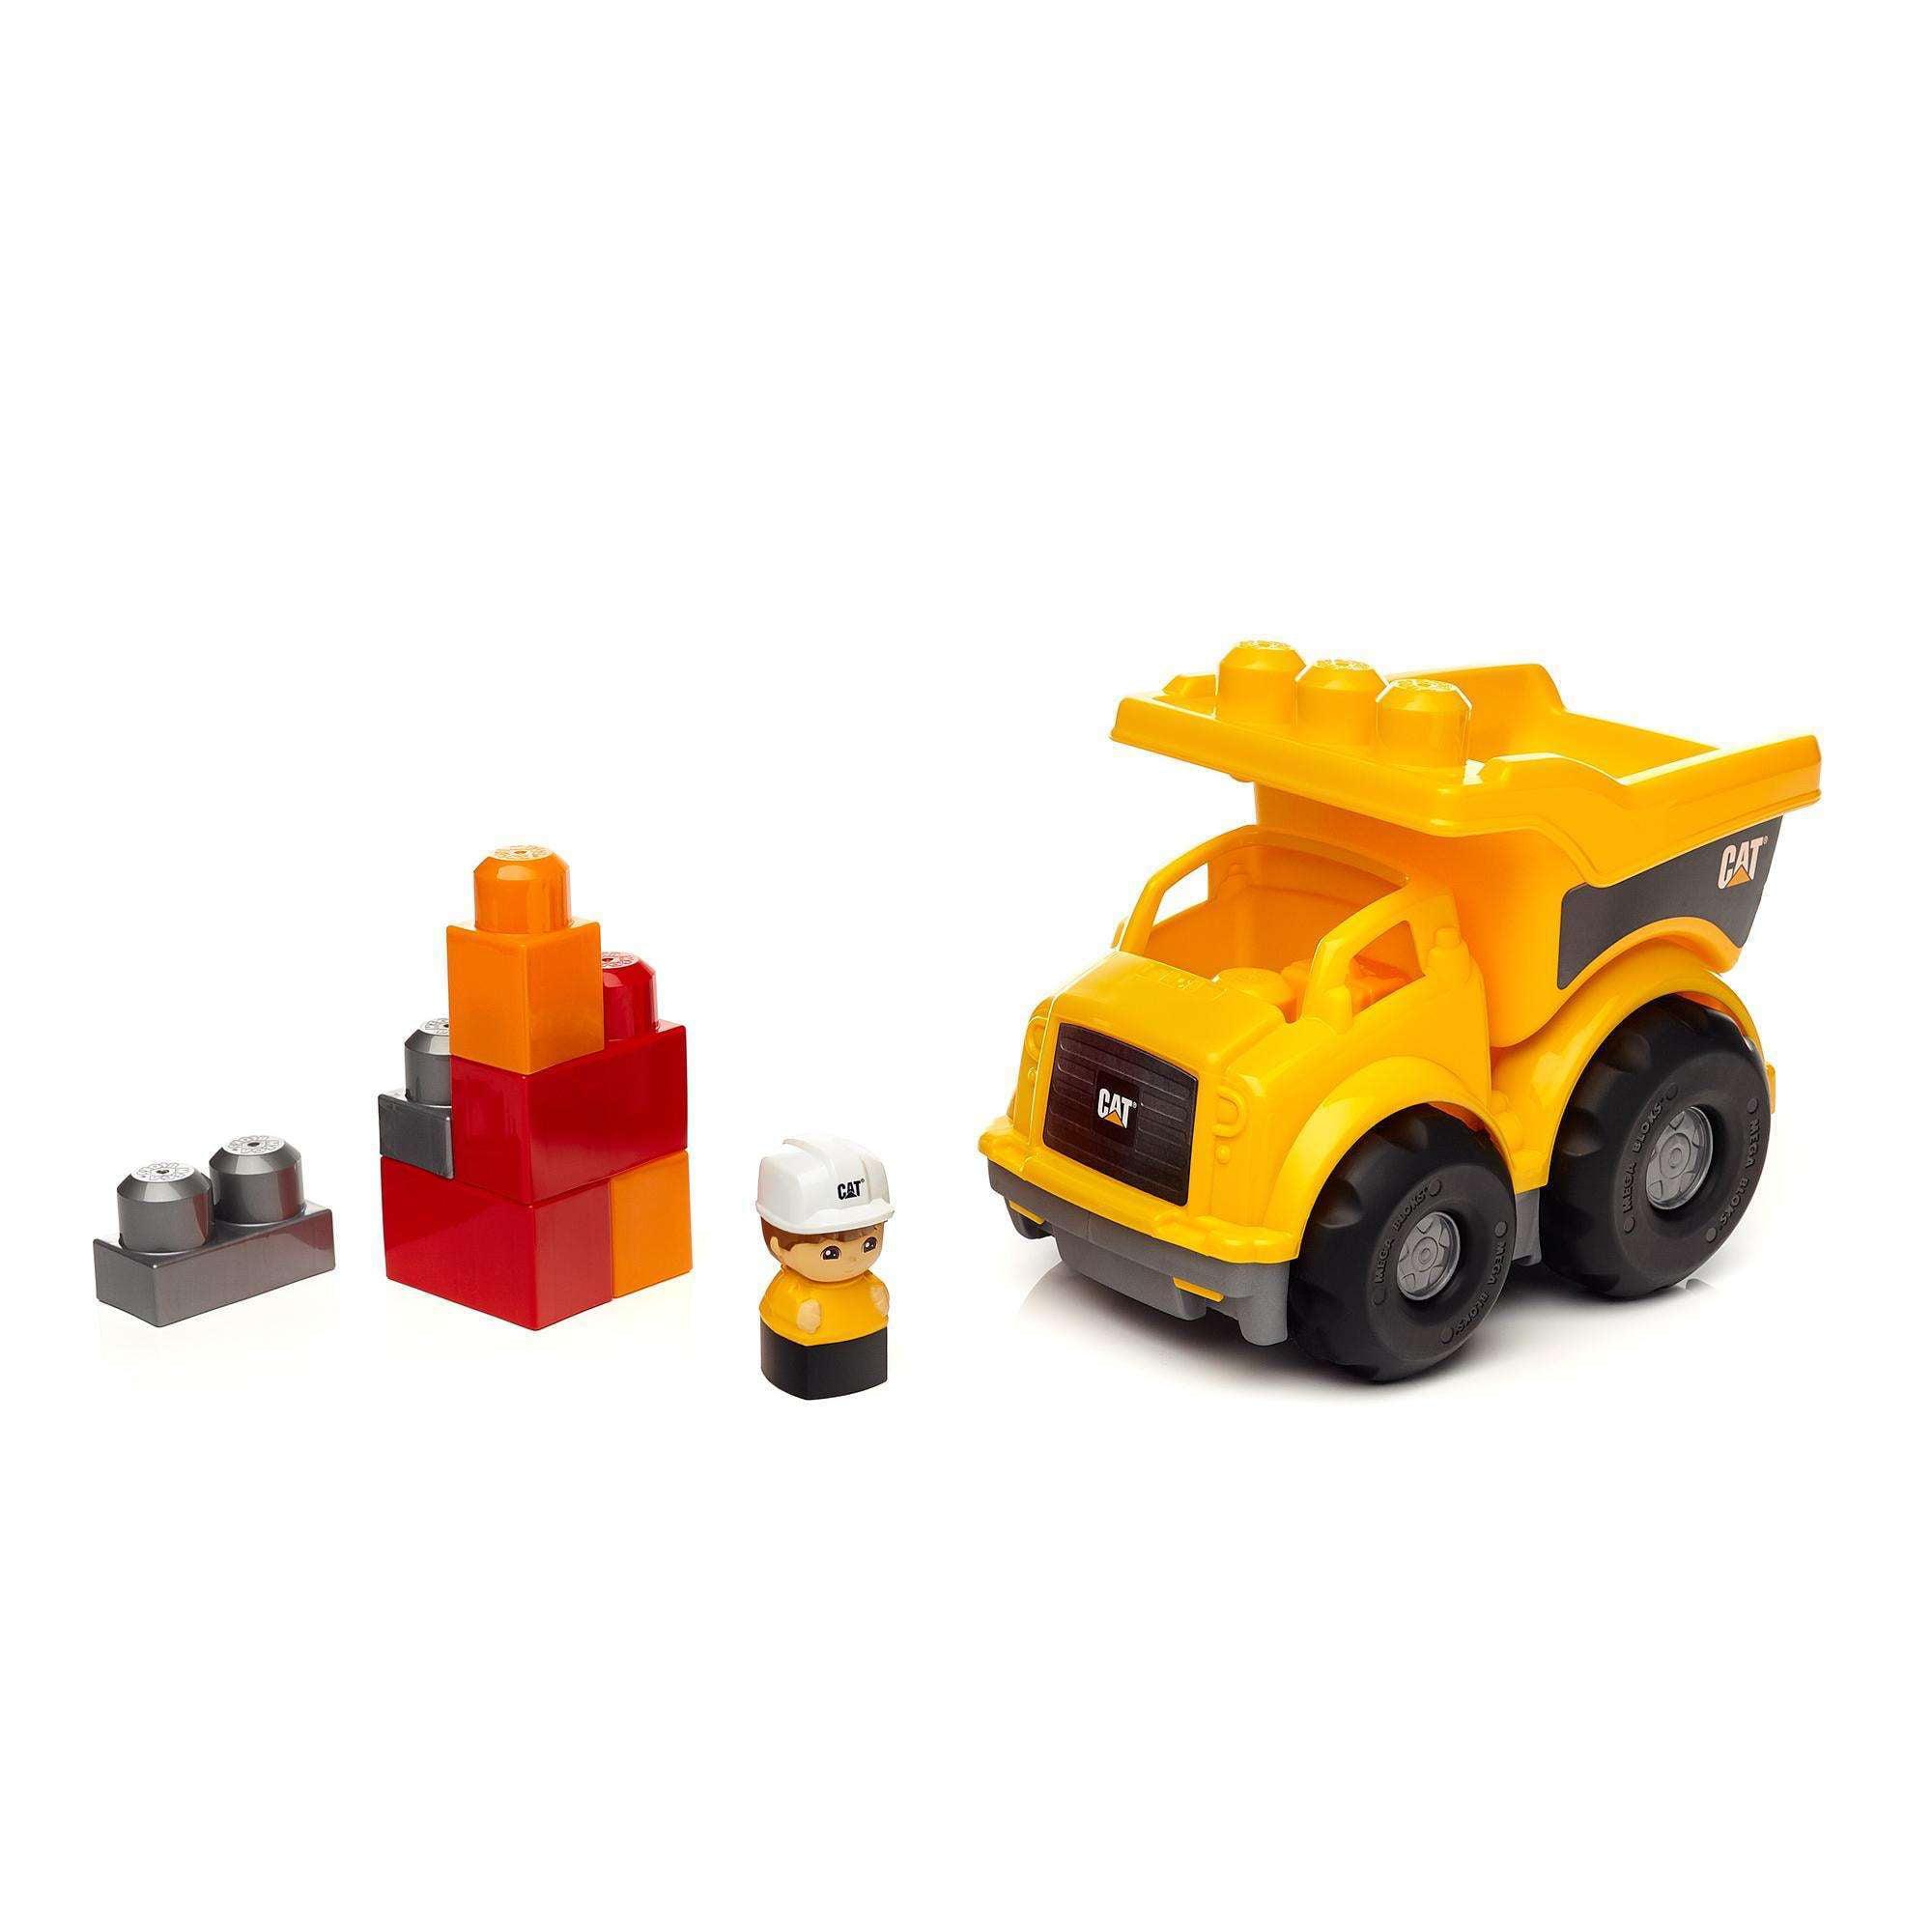 Mega Bloks CAT Lil' Dump Truck by Mattel